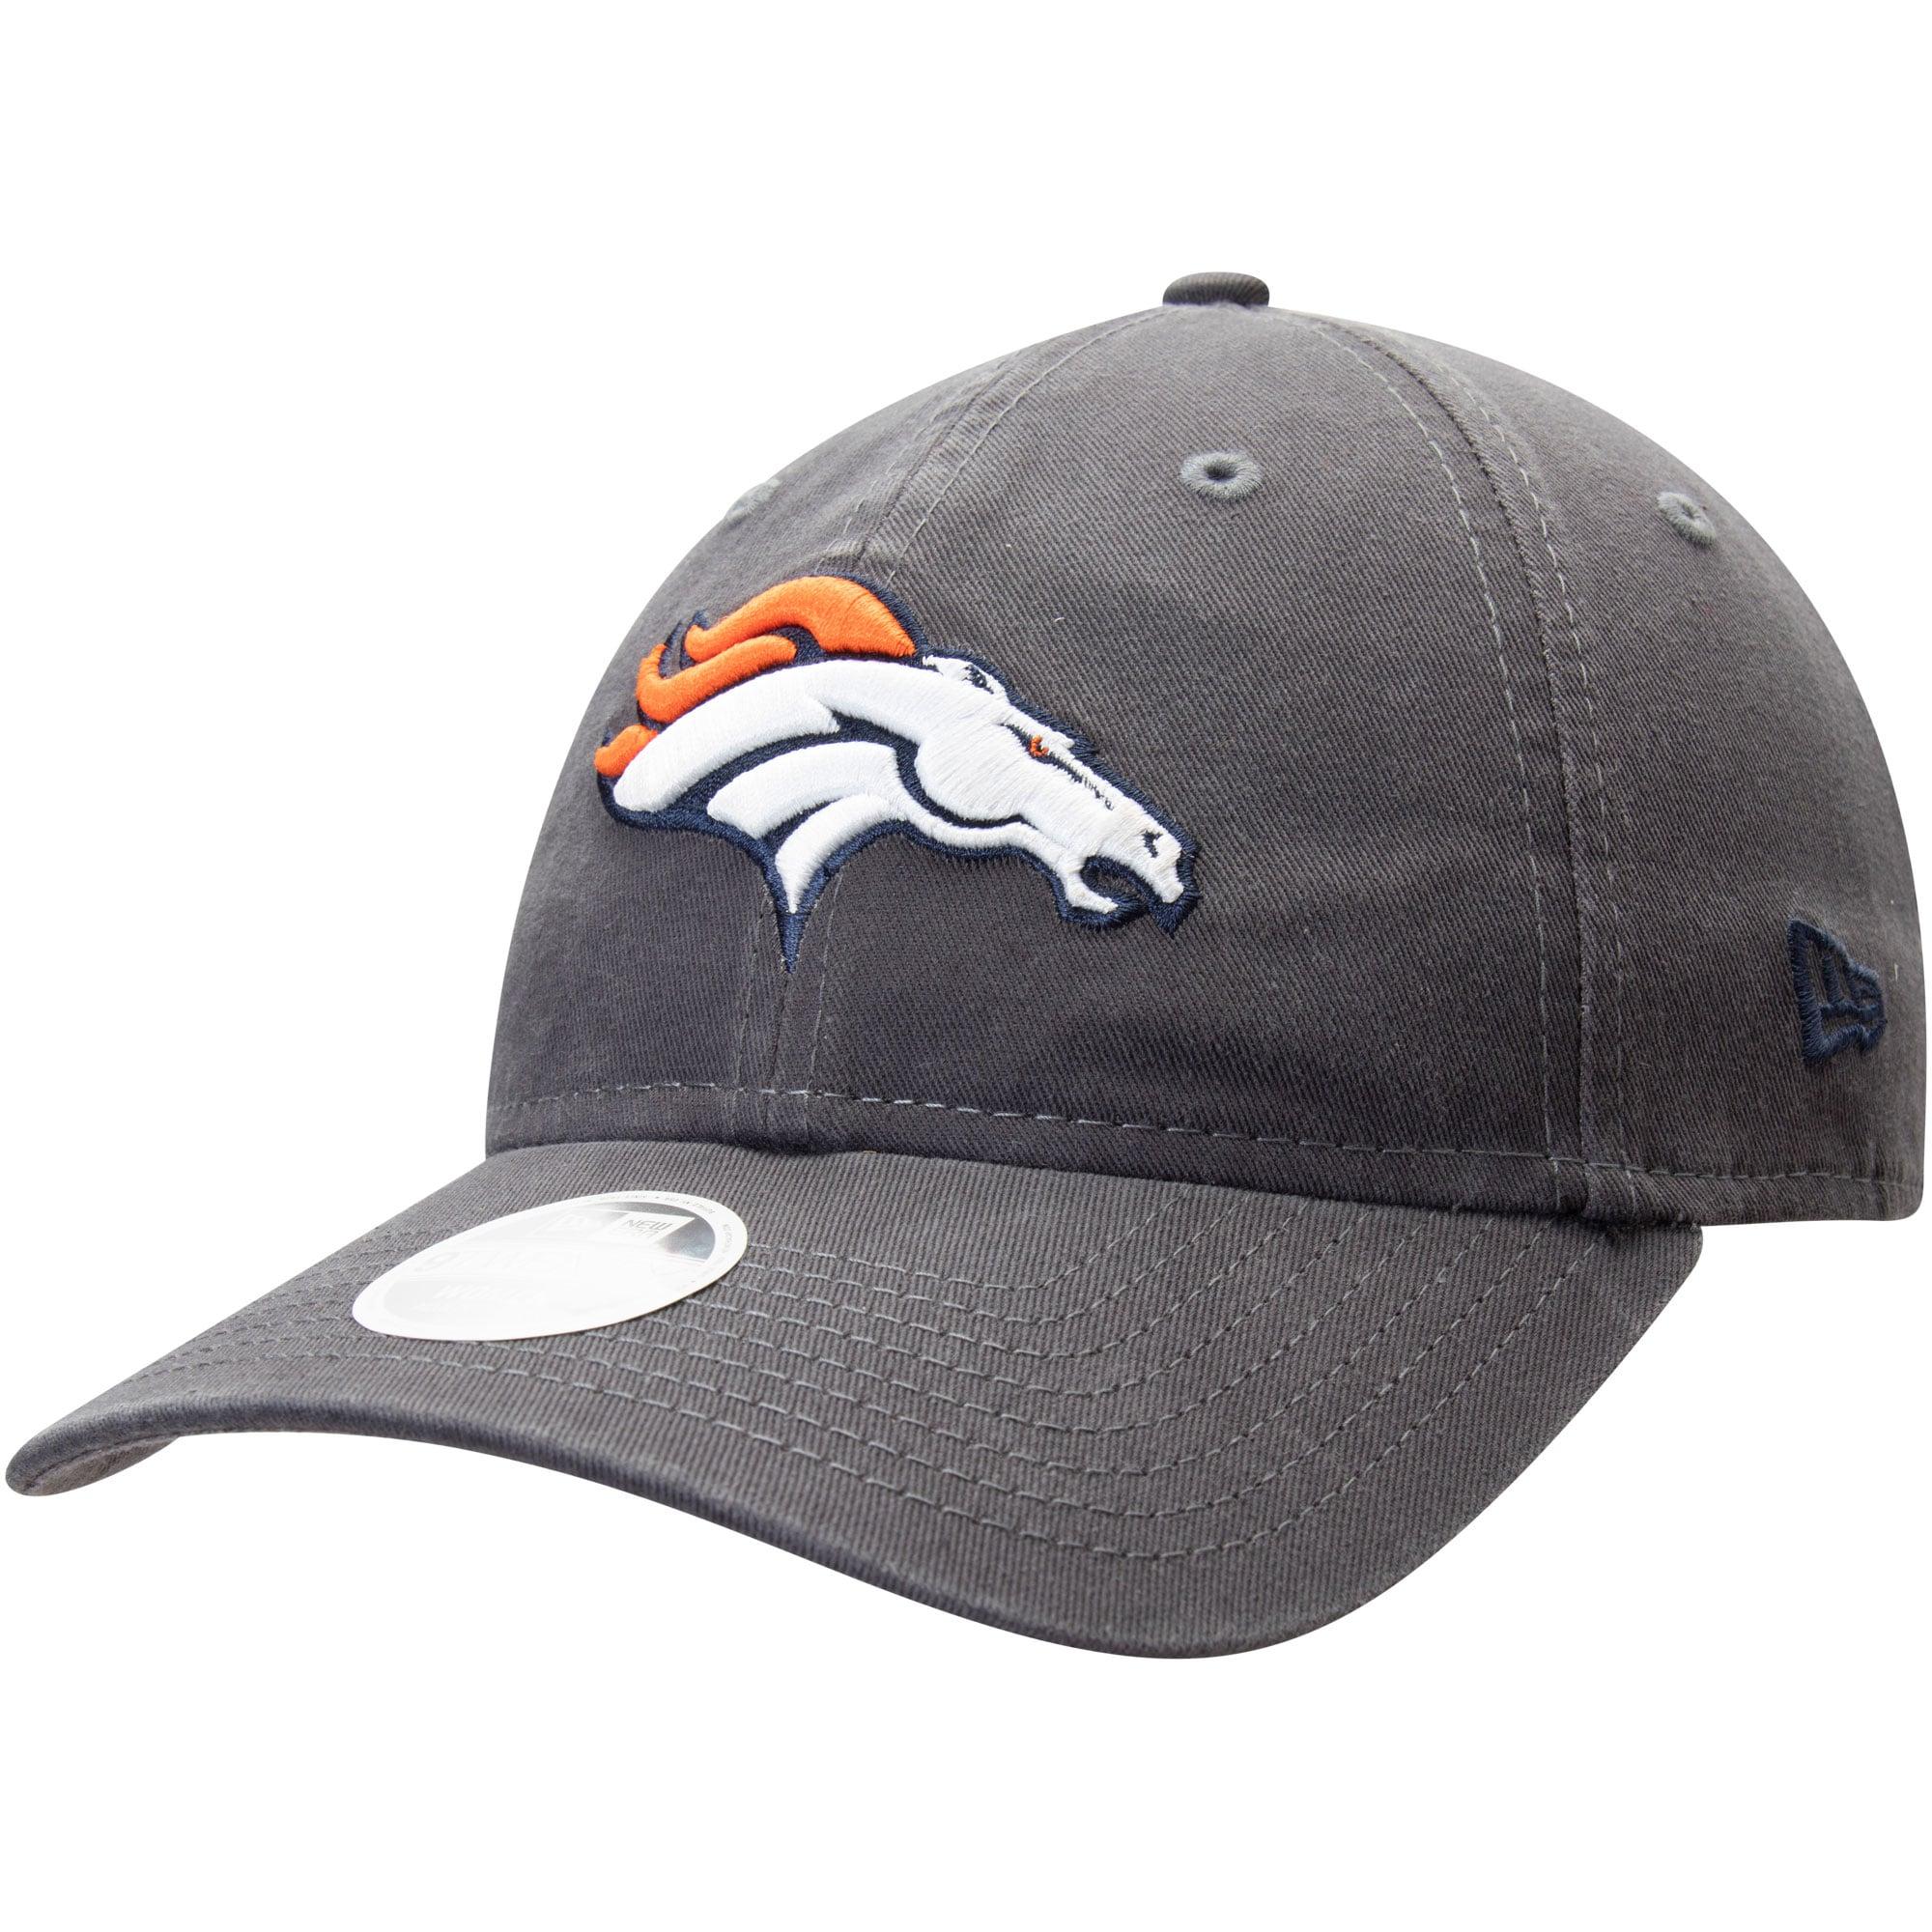 Denver Broncos New Era Women's Team Logo Core Classic 9TWENTY Adjustable Hat - Graphite